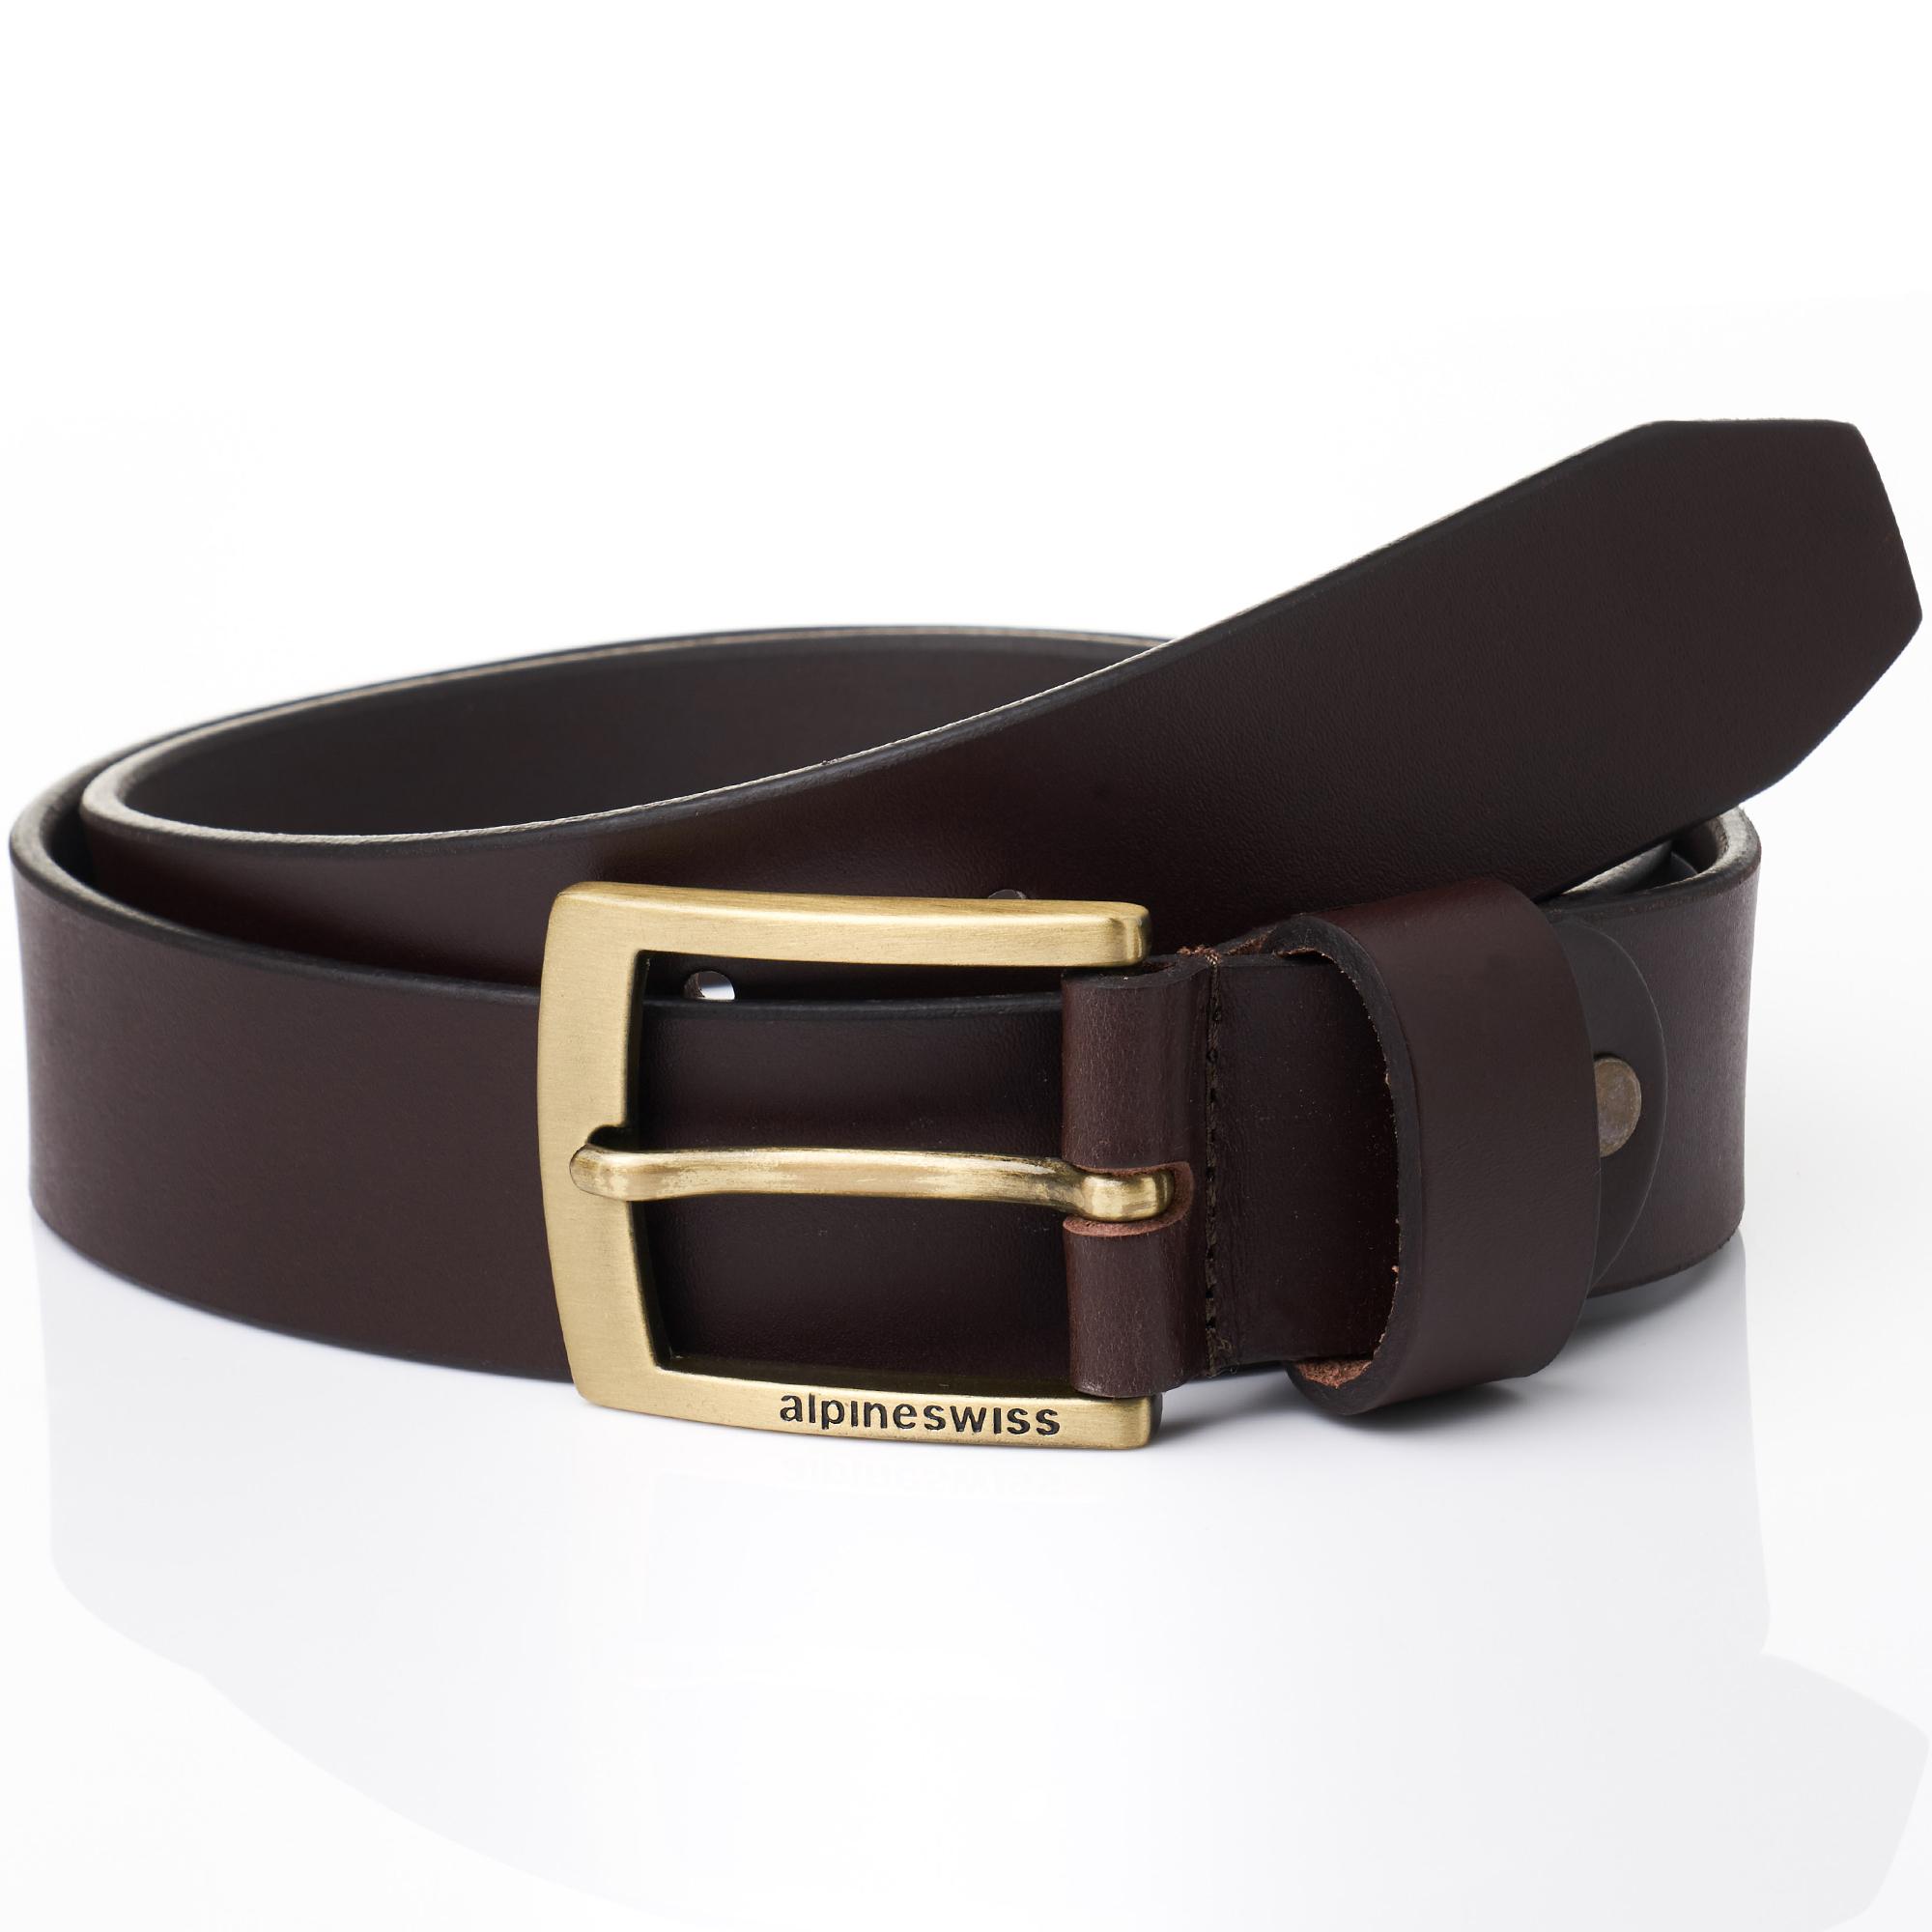 Alpine-Swiss-Mens-Leather-Belt-Slim-1-1-4-Casual-Jean-Dakota-Signature-Buckle thumbnail 15